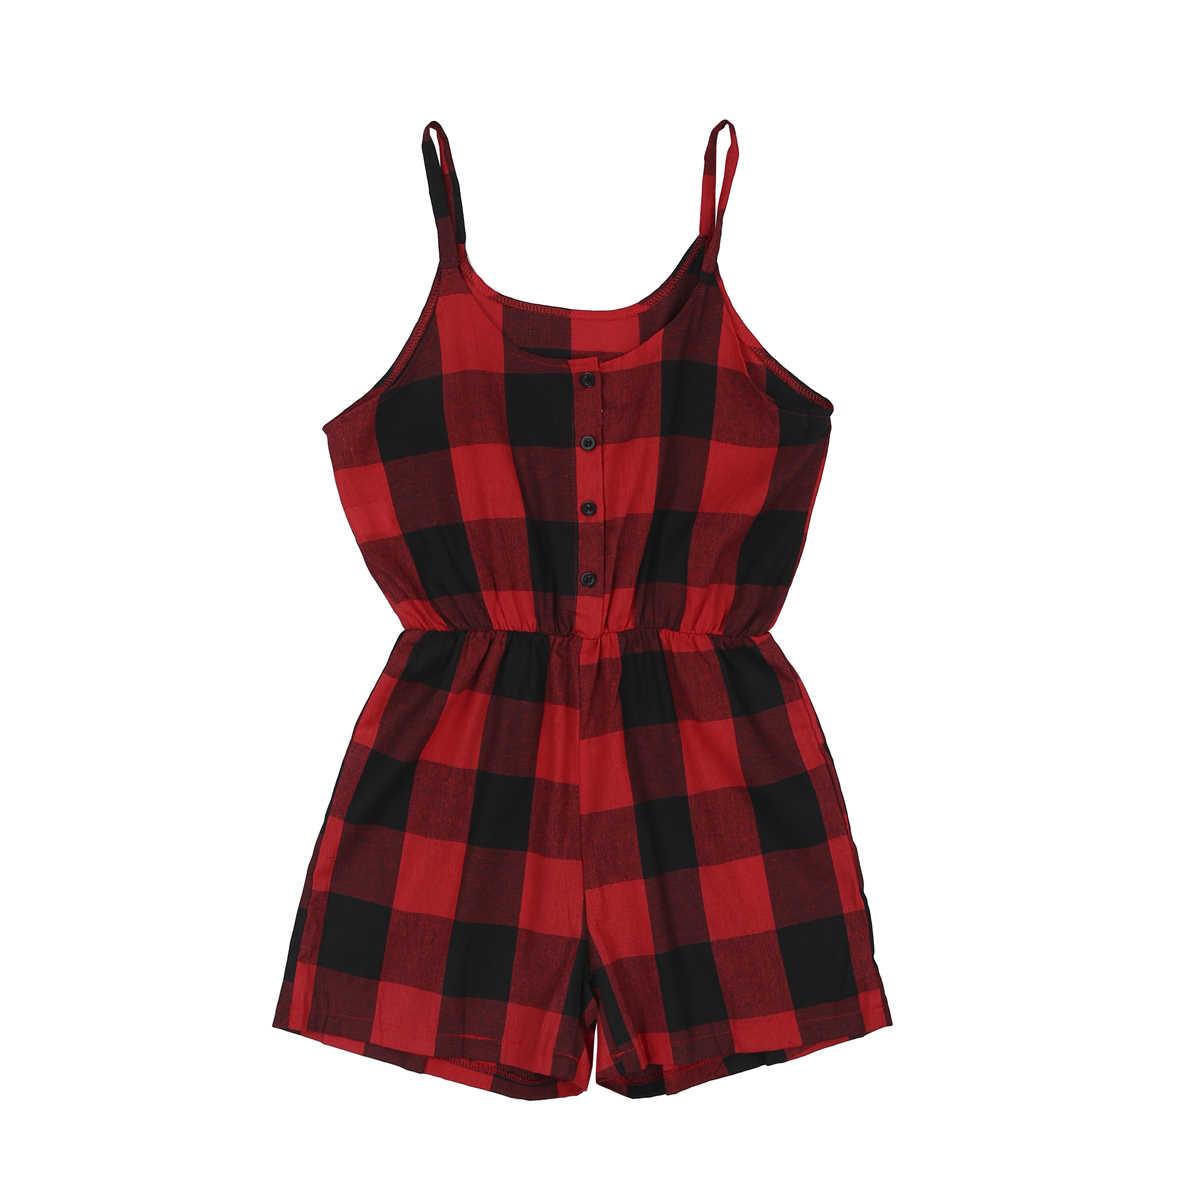 Citgeett 夏家族マッチング服母娘ノースリーブチェック柄親子ロンパースジャンプスーツ女性子供衣装